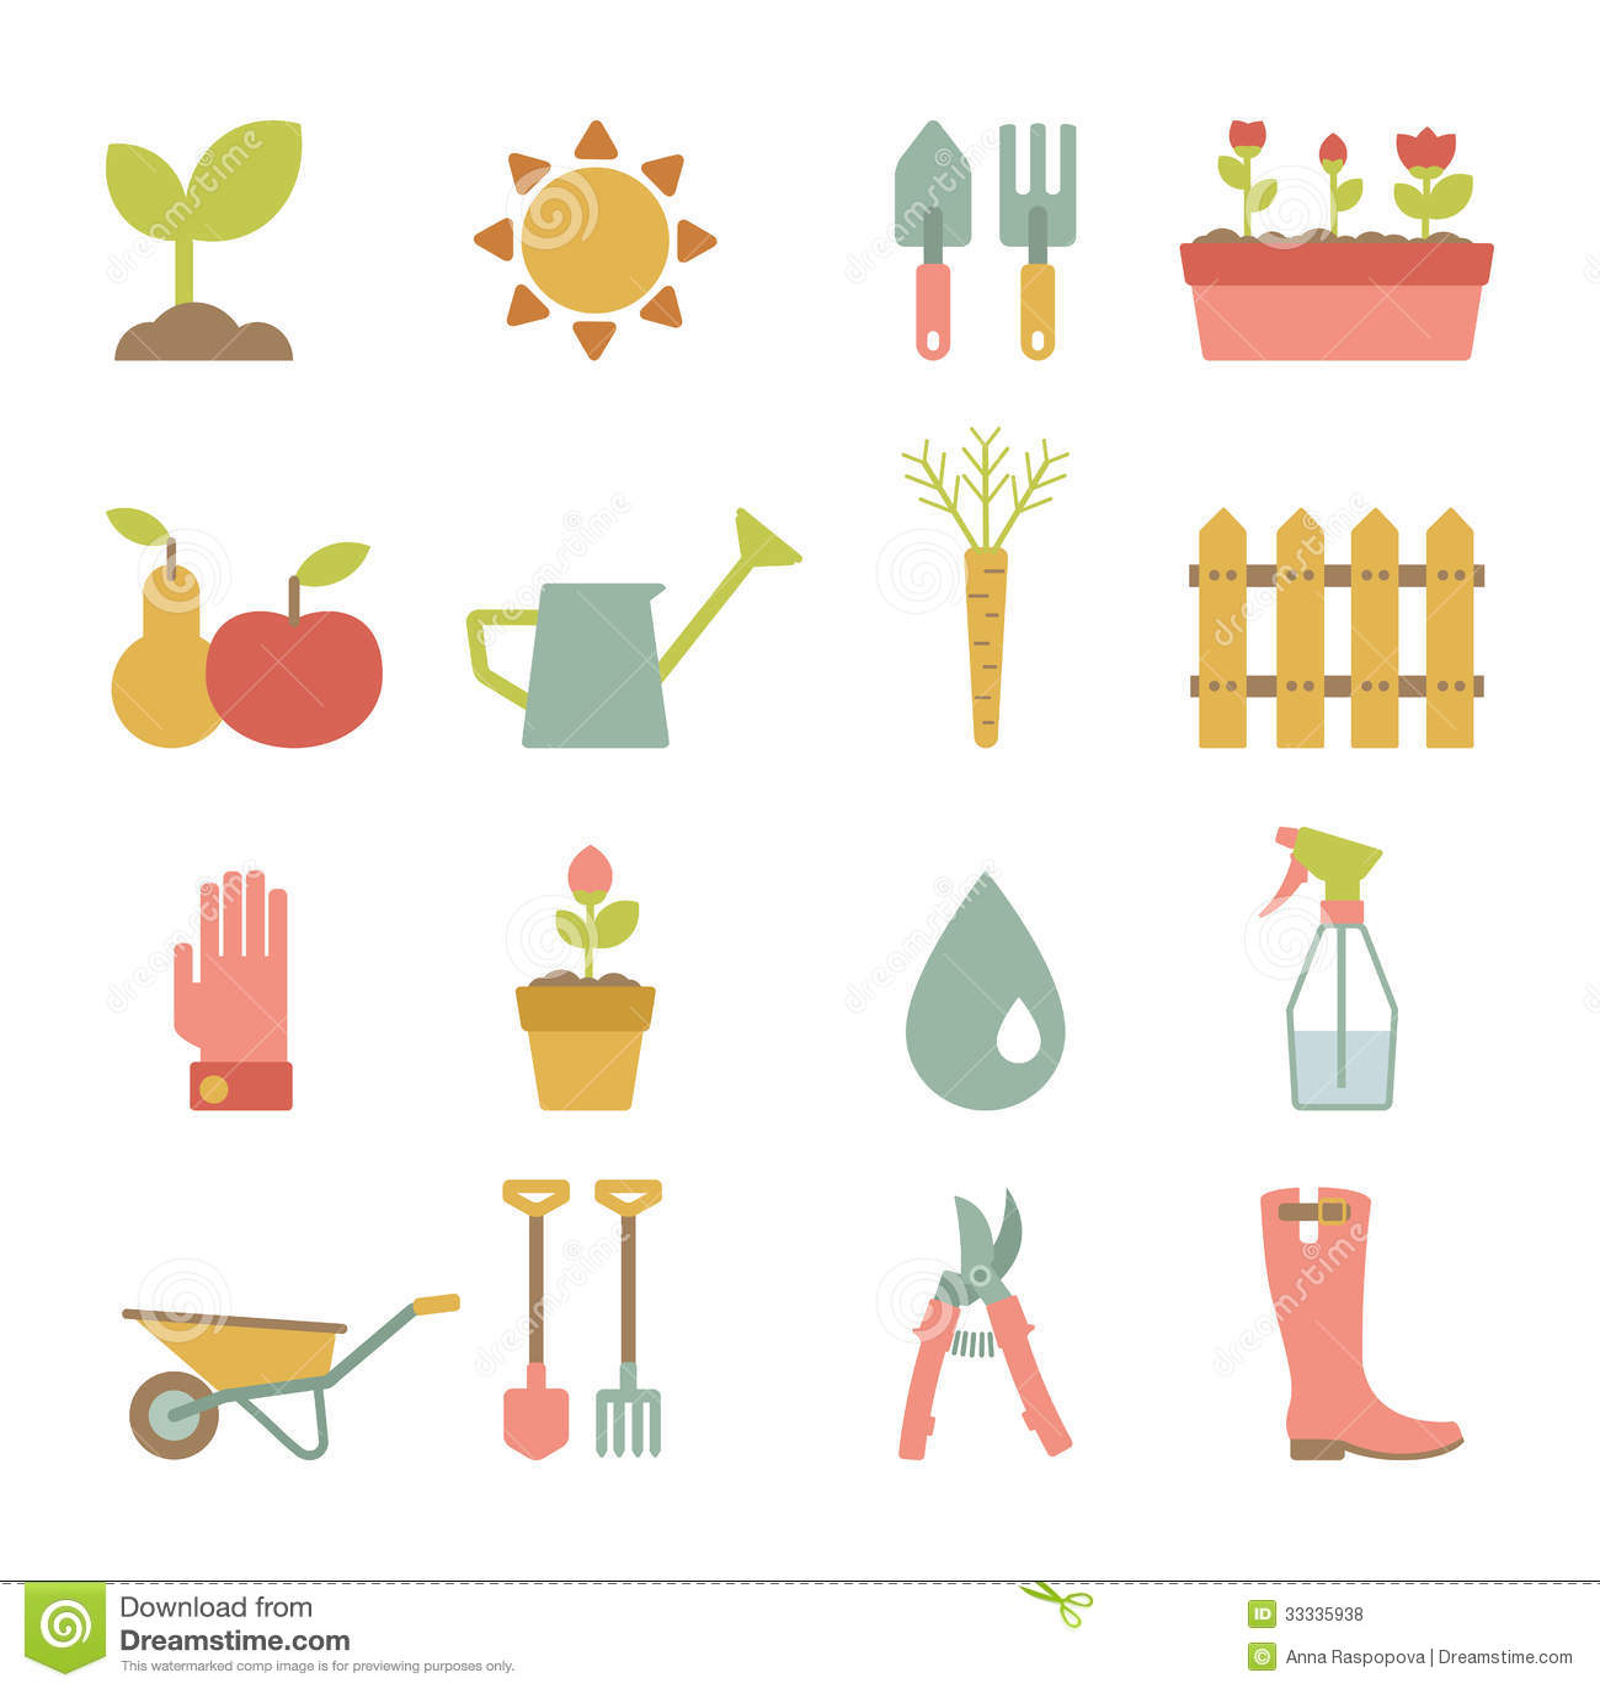 Gardening Icons Stock Vector. Illustration Of Flower